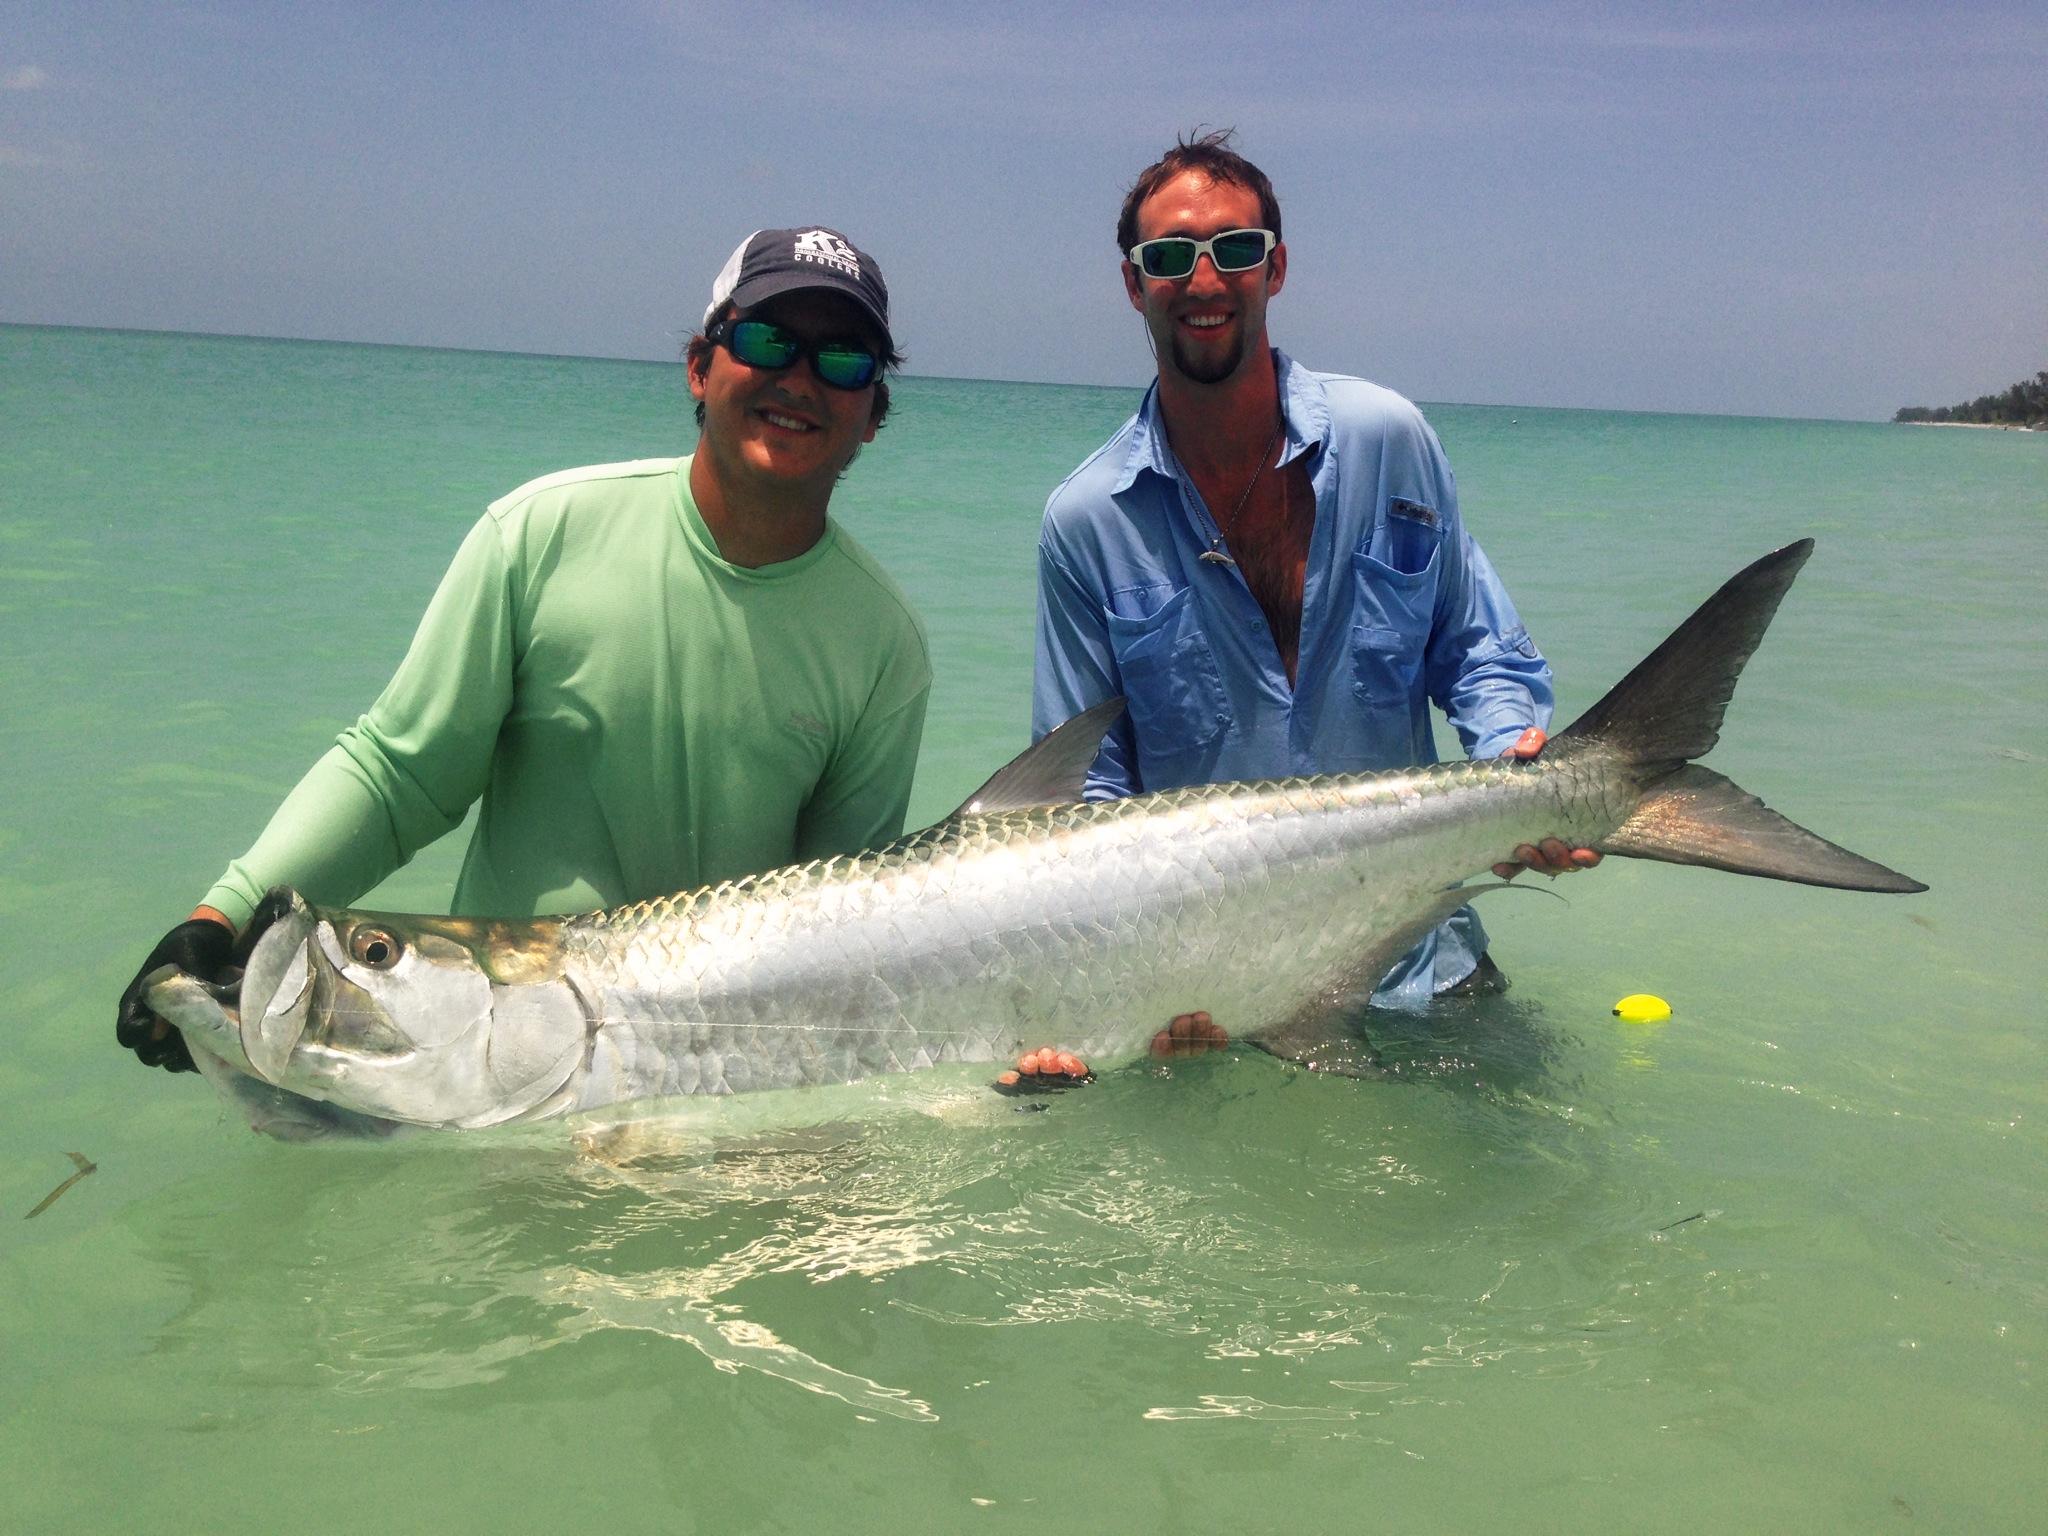 Cameron Schurlknight, Tarpon, Southwest Florida